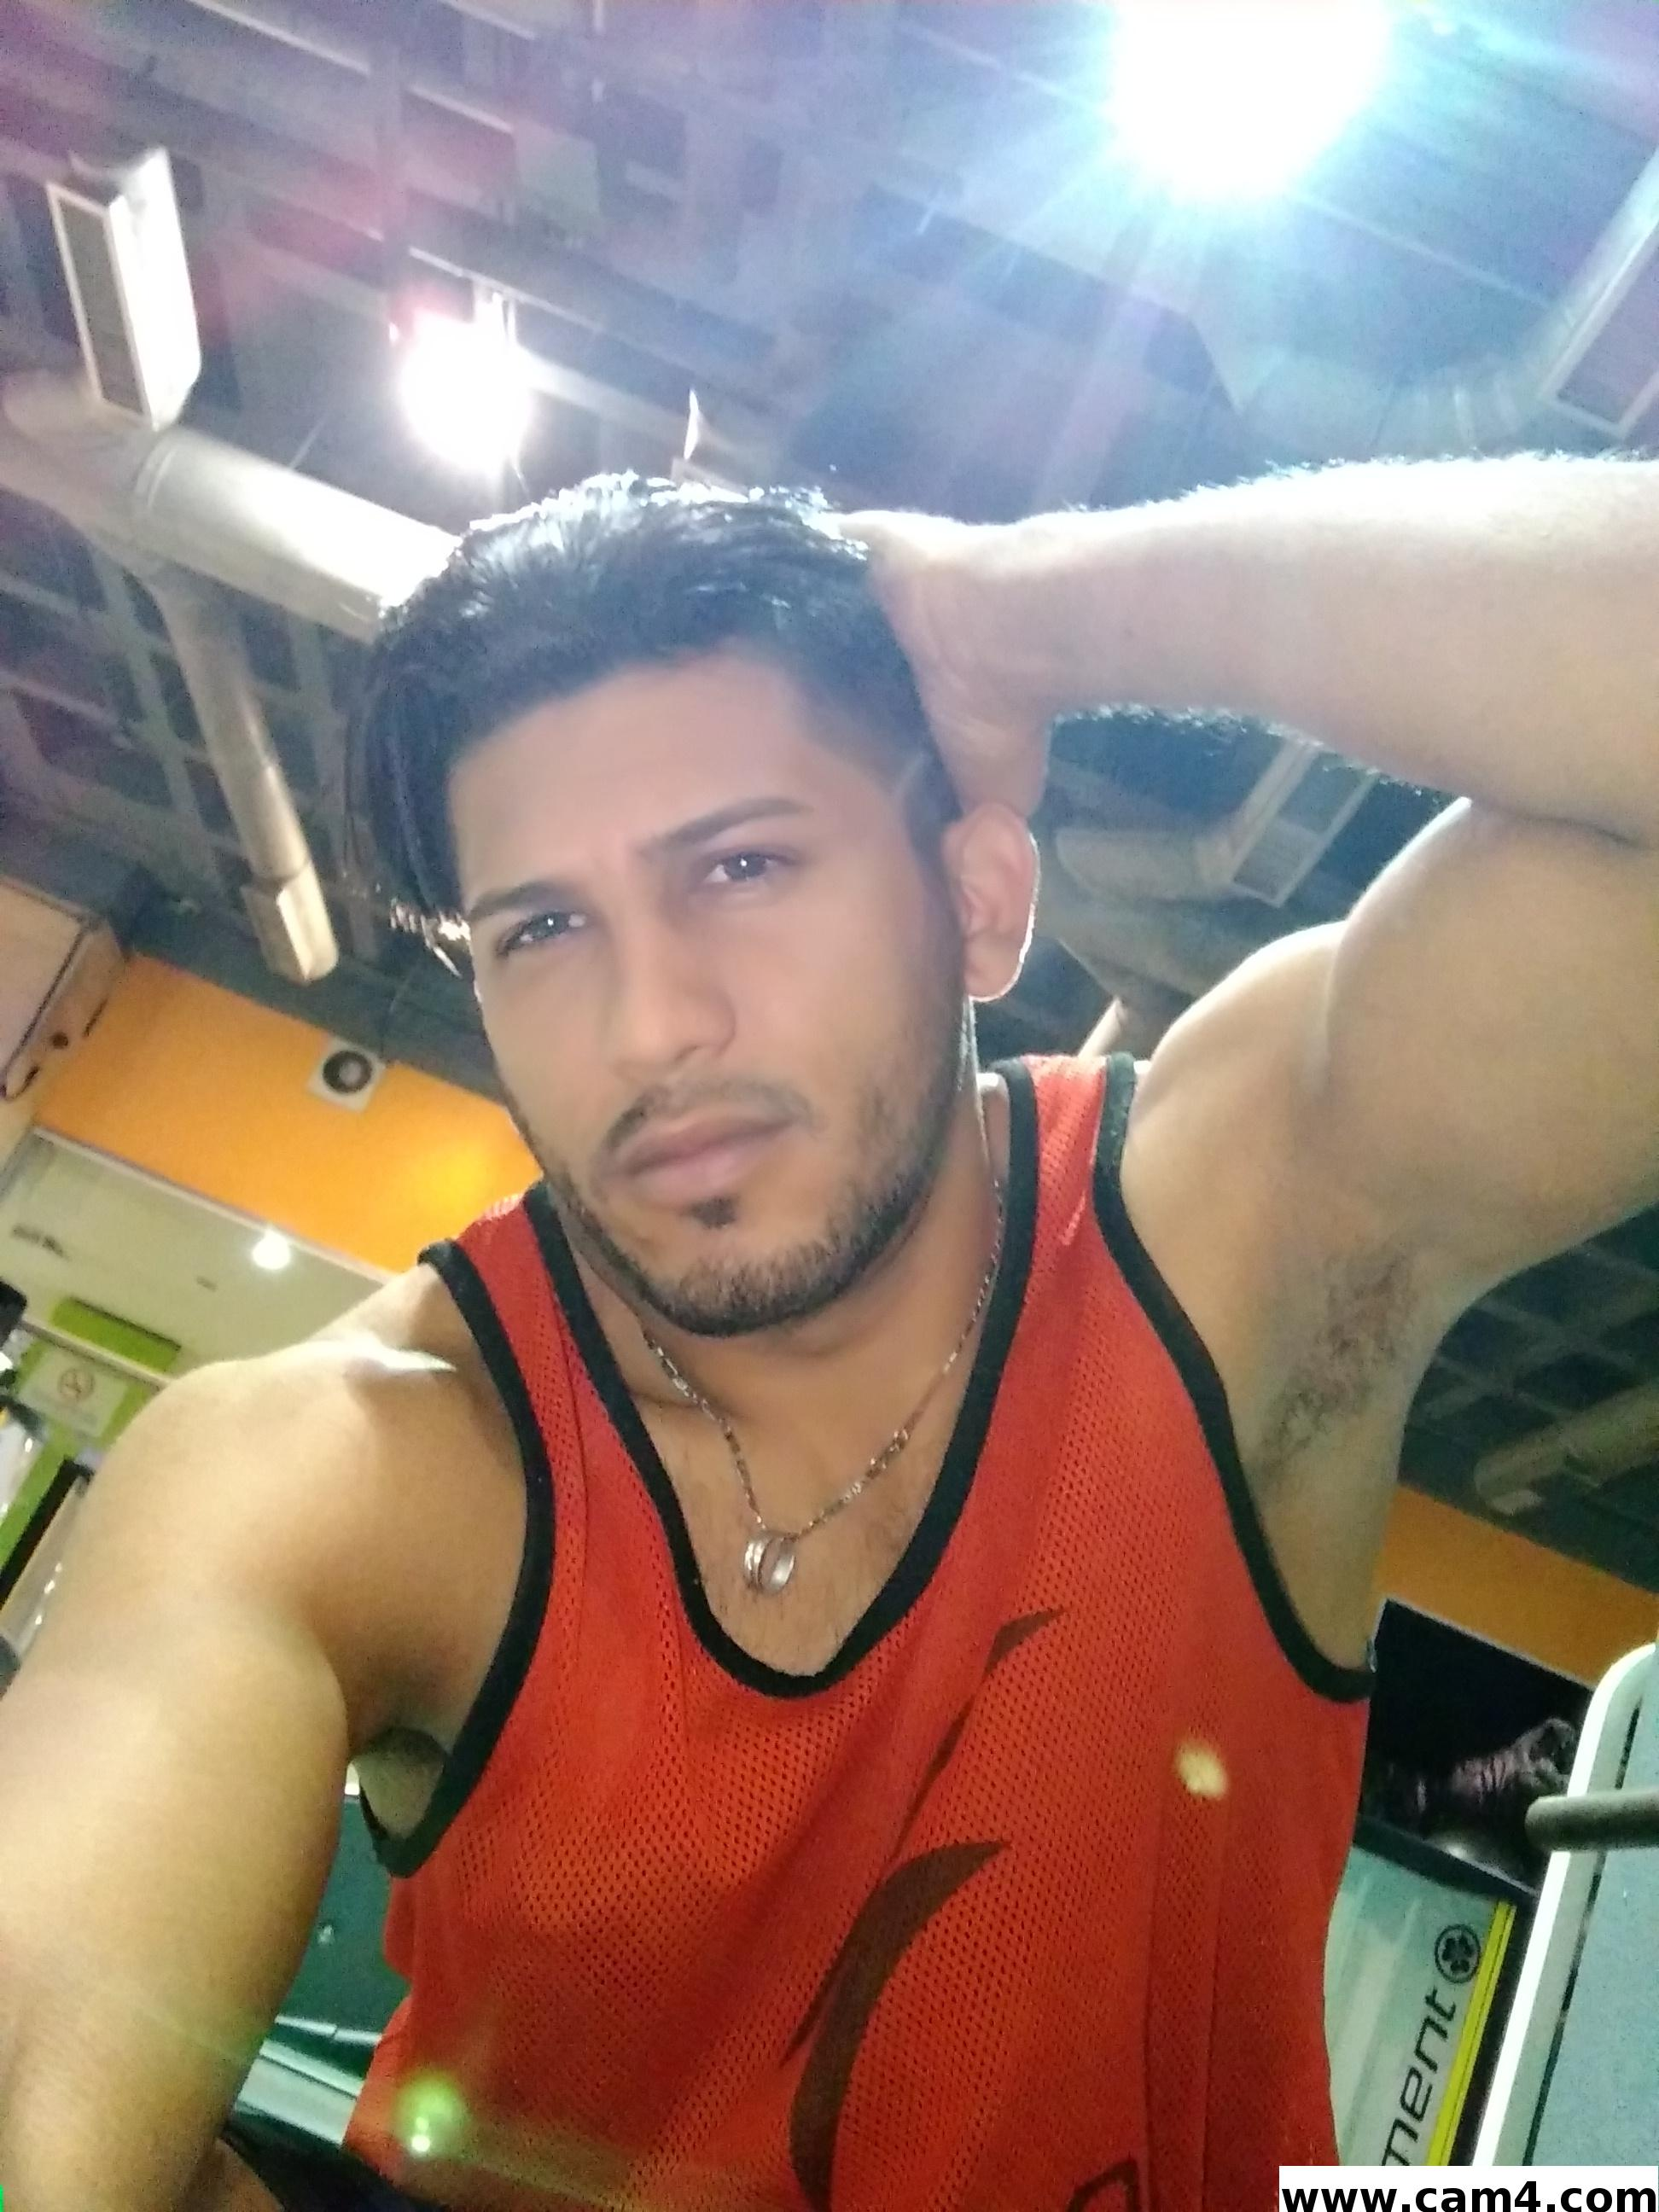 Ricardo0286?s=ucv3ih9onbahkebbxohi7ez559re3j8kuwwaowahdkg=